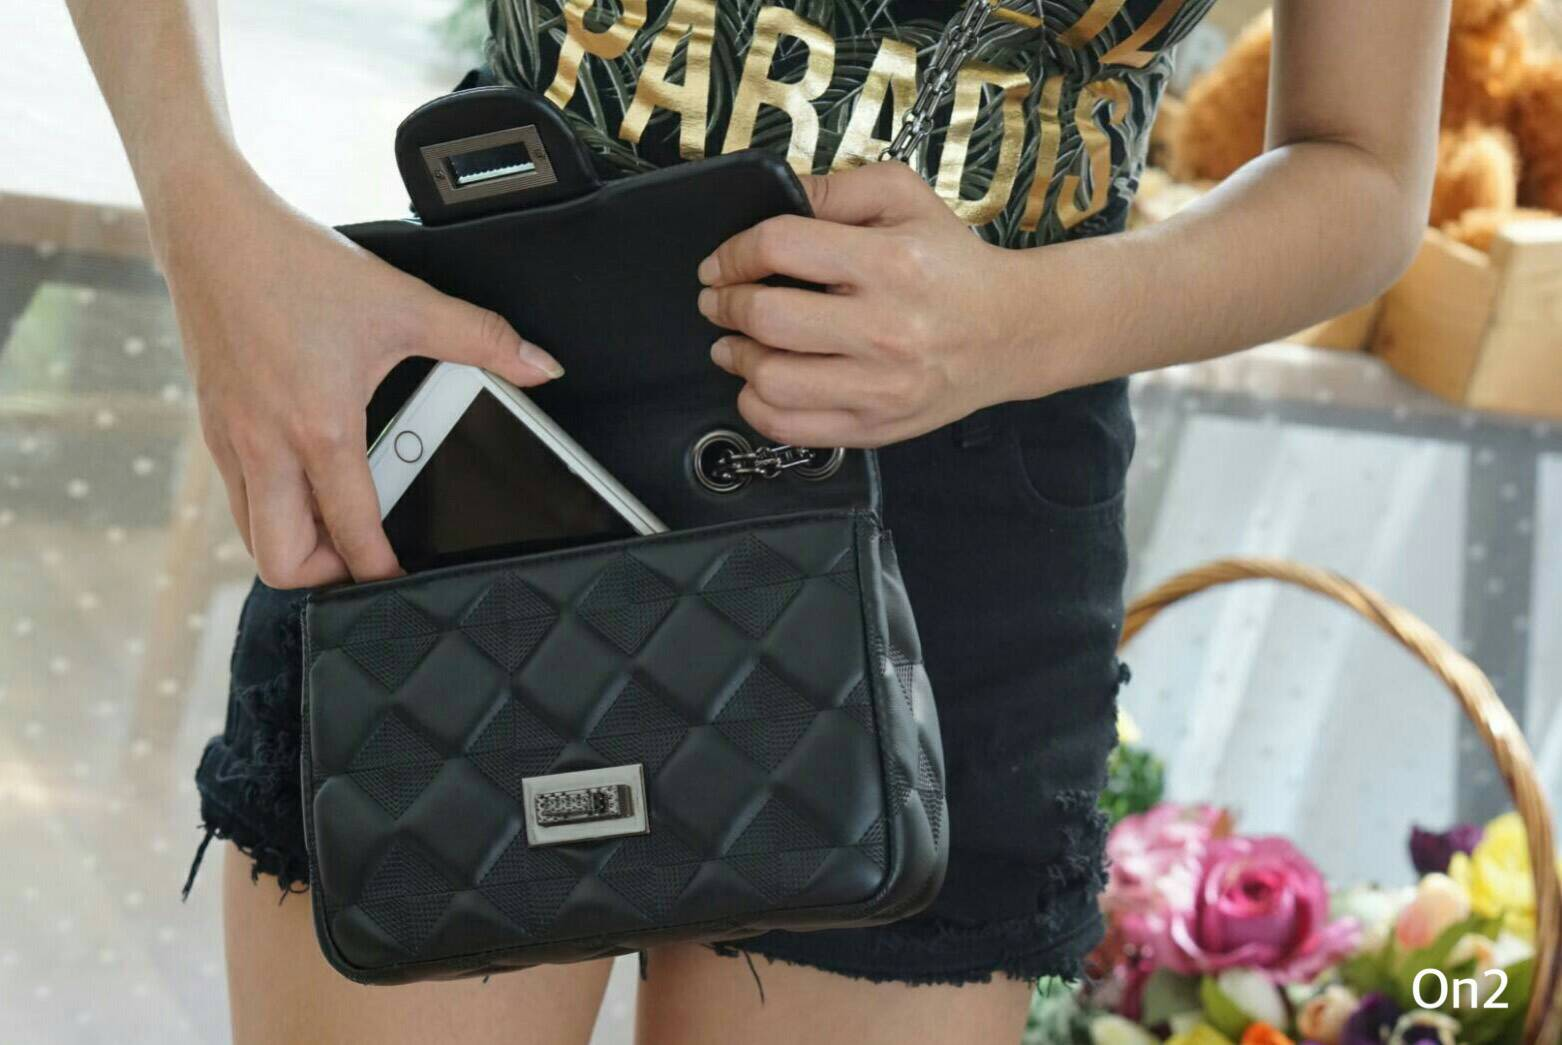 Chanel classic bag ใช้ง่ายดูดี เย็บเป็นข้าวหลามตัดรอบใบ